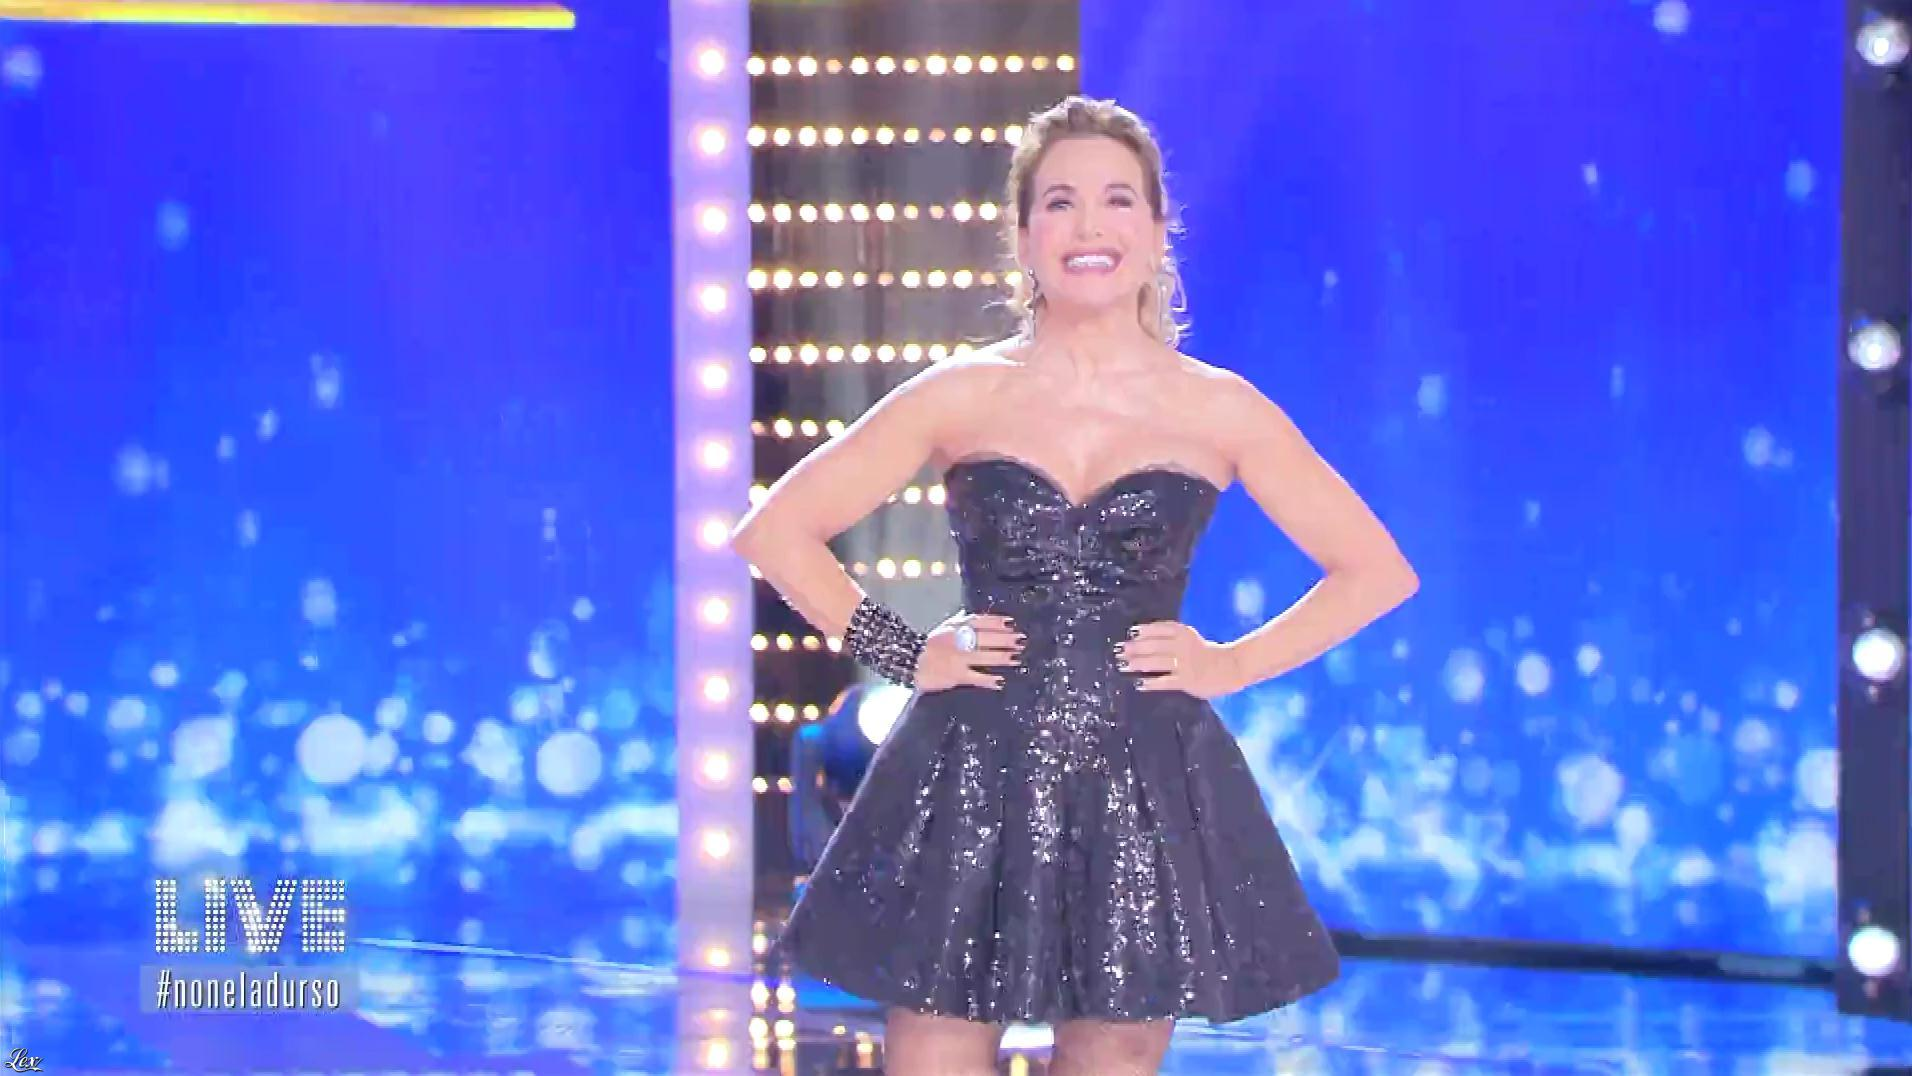 Barbara d'Urso dans Non è la d'Urso. Diffusé à la télévision le 04/11/19.